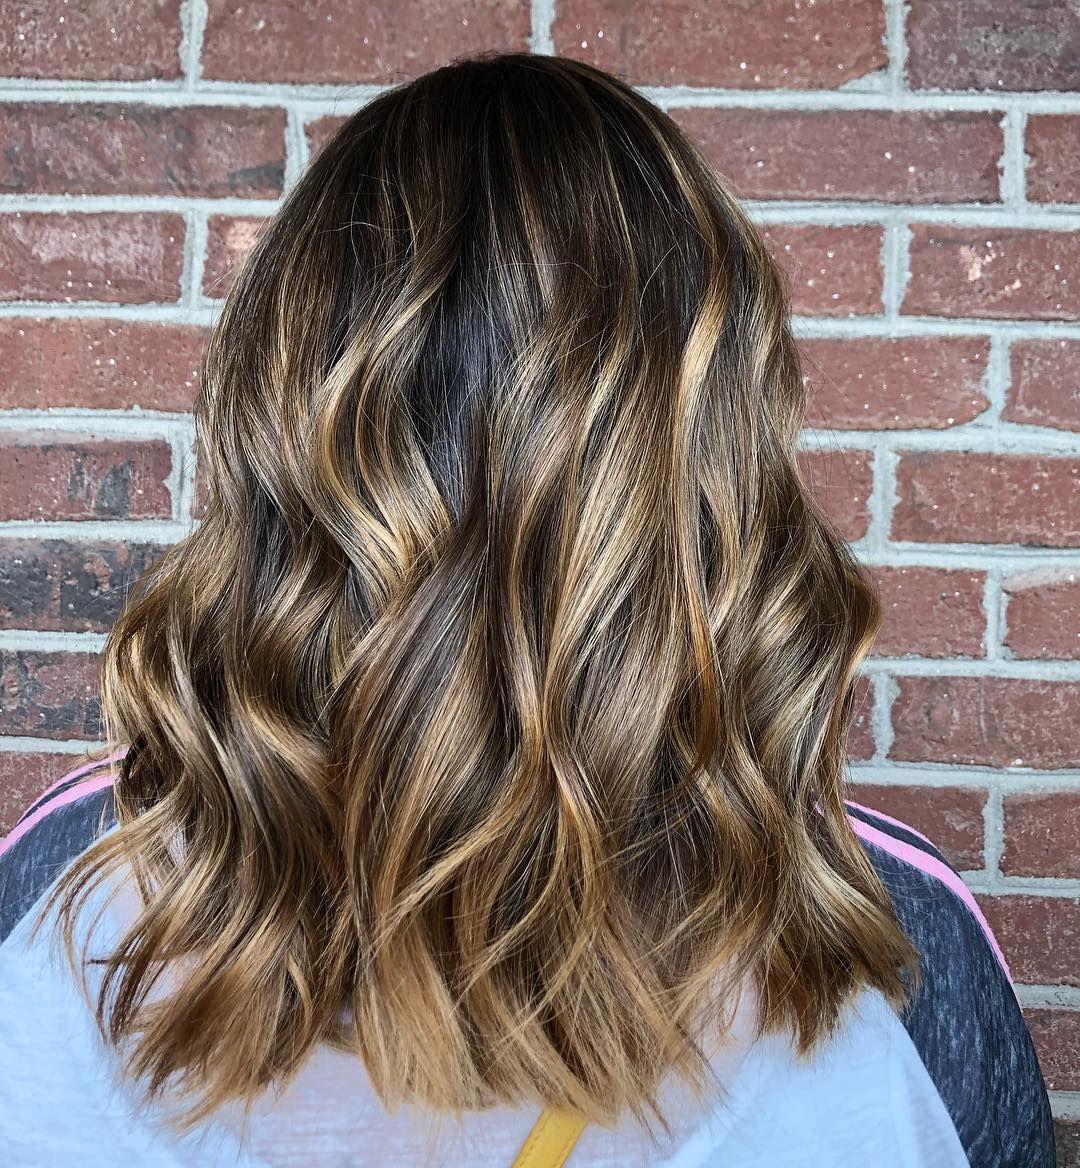 Utah County Hair Salon On Instagram She Has So Much Hair Isn T It Pretty Balayageandfoils Utahhair Spanishforkhair Hair Salon Hair Long Hair Styles